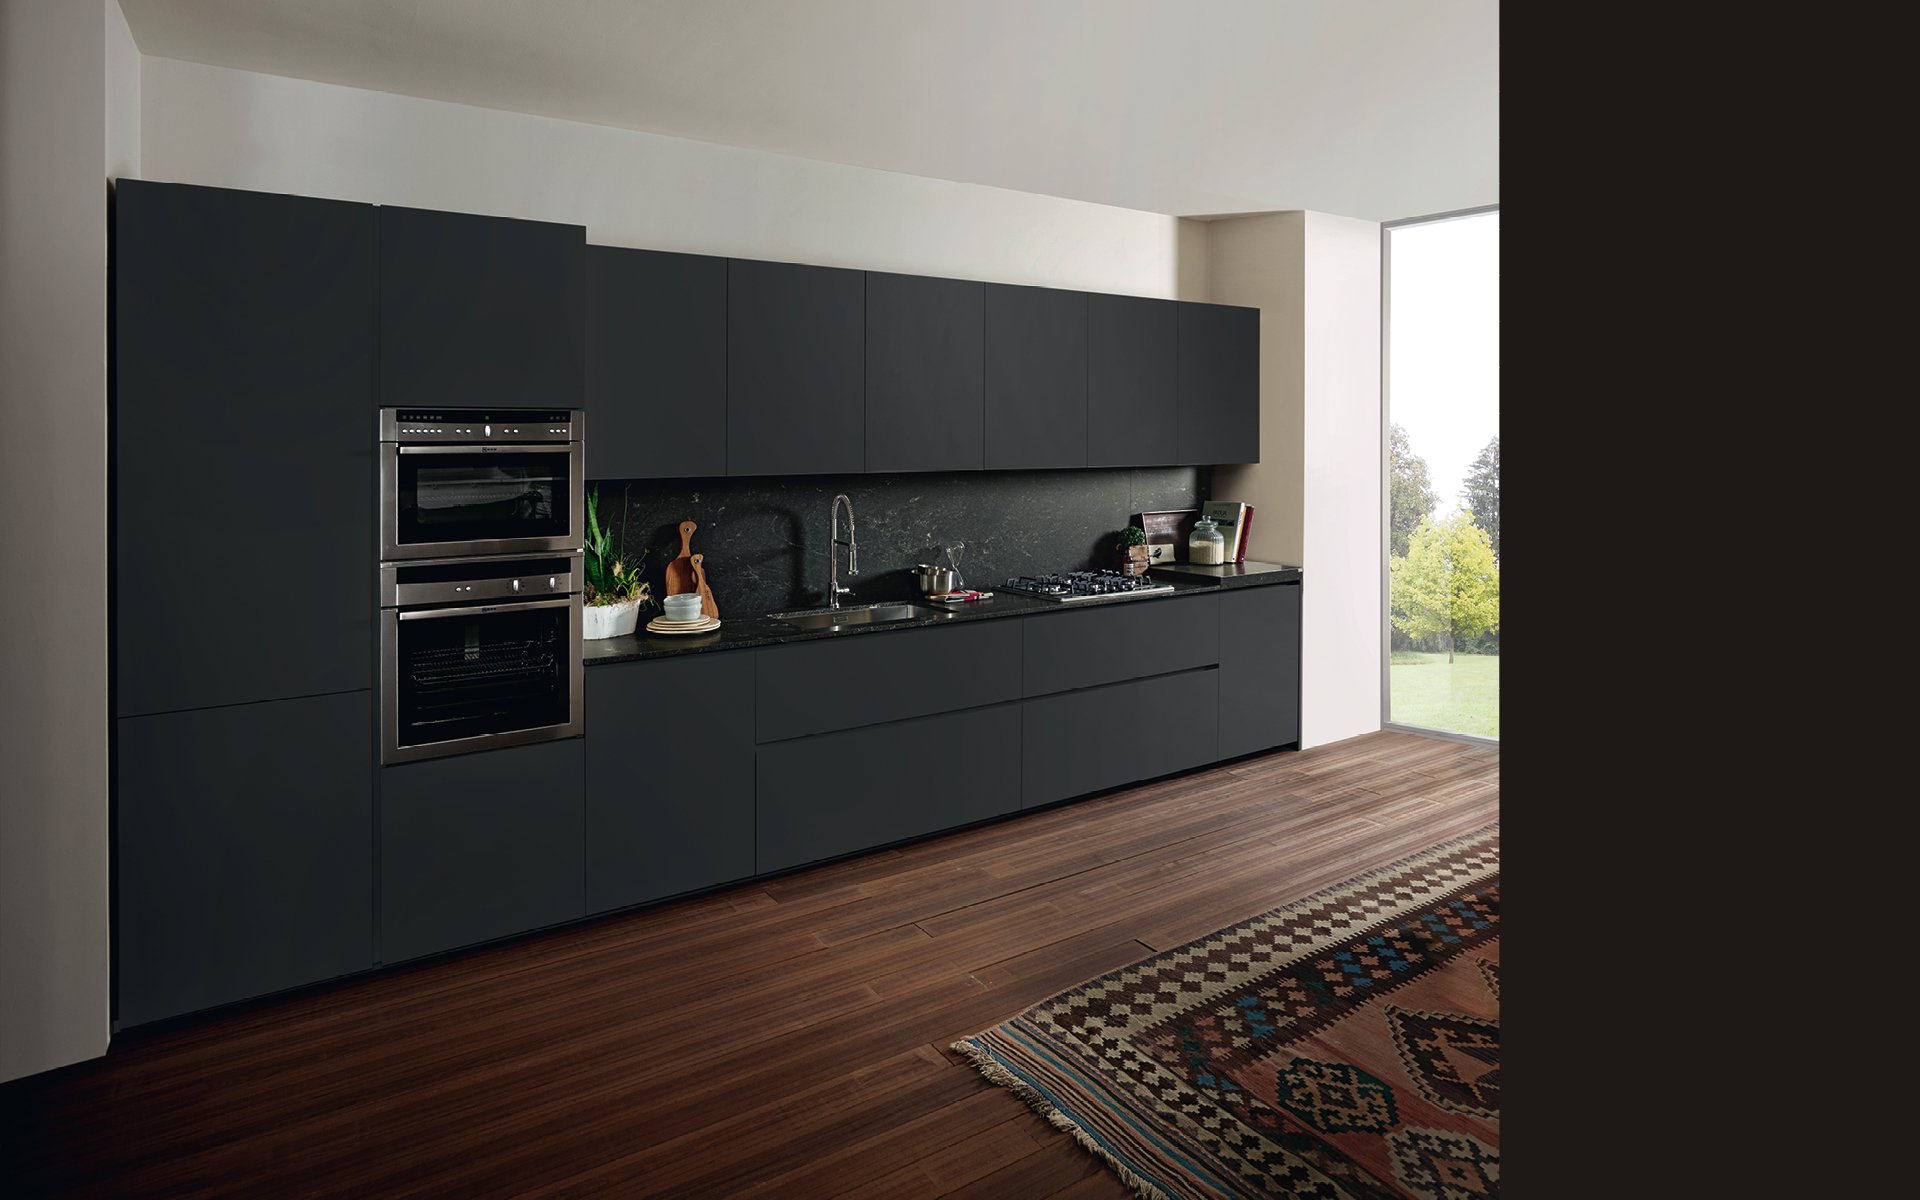 Arredamento cucine vendita cucine cagliari quartu ambiente cucina - Centro cucine cagliari ...